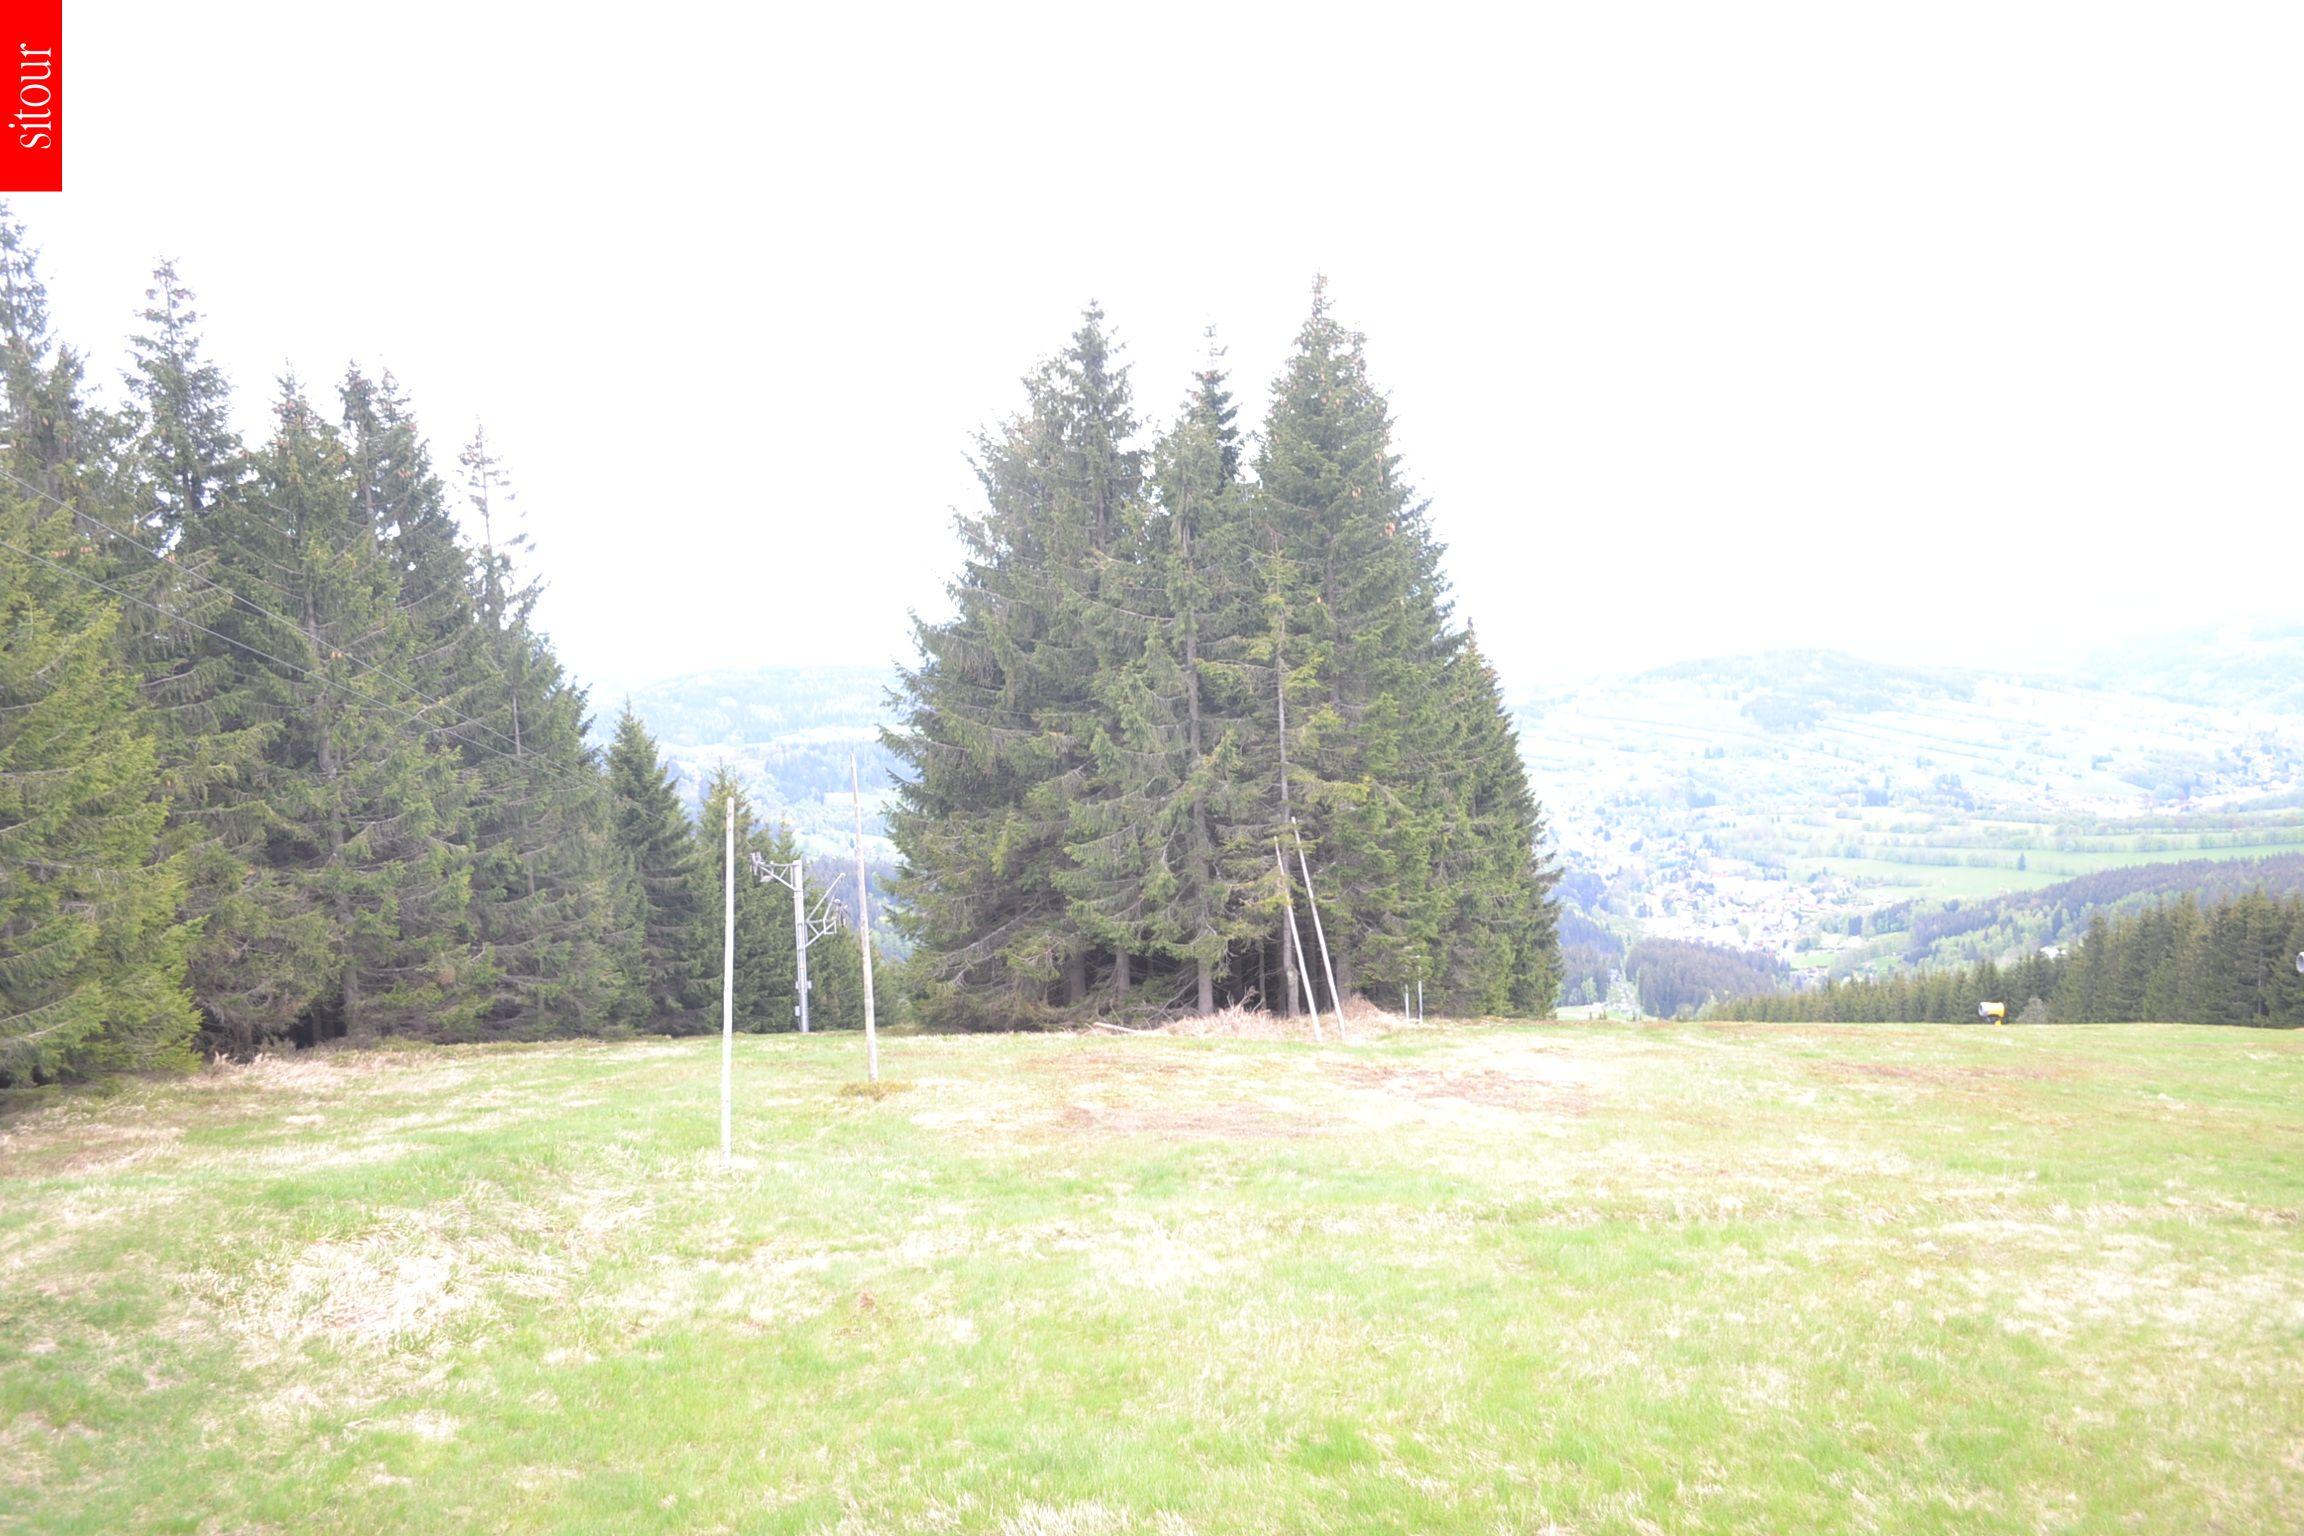 Webcam Ski Resort Rokytnice n. Jizerou cam 5 - Giant Mountains